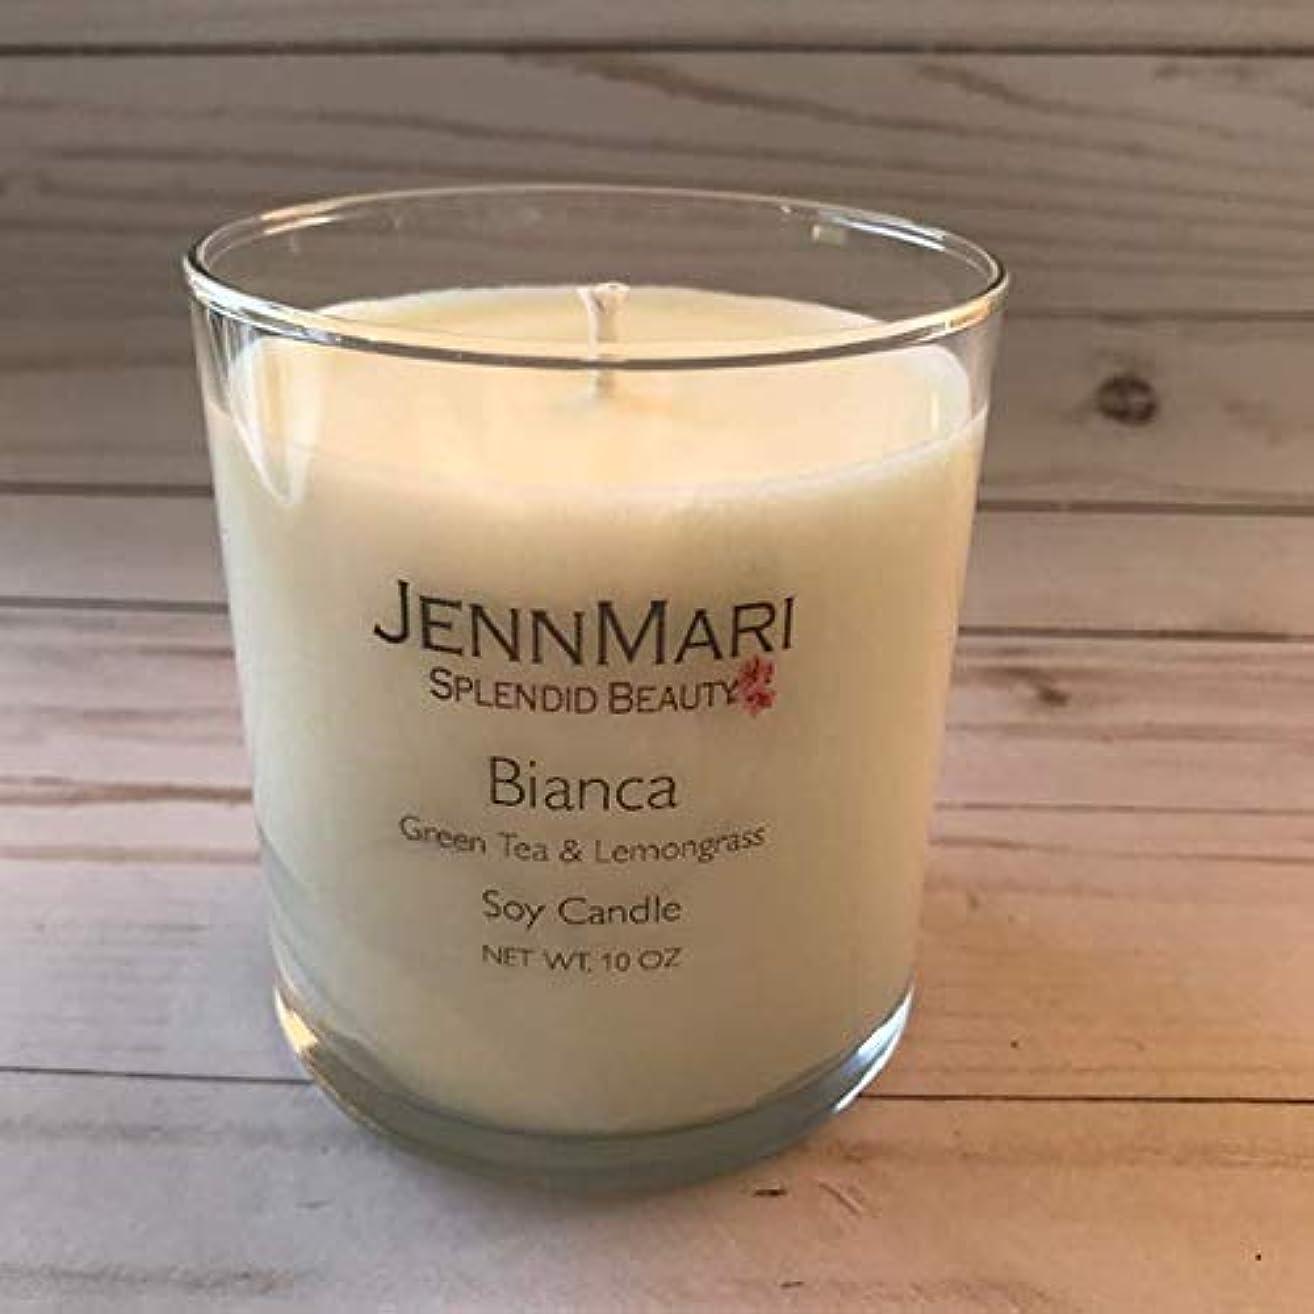 Splendid Beauty   Green Tea & Lemongrass Scented Soy Candle Glass Jar   10 Oz   Handmade   Eco-friendly   Vegan   Cotton Wick   100% Soy Wax